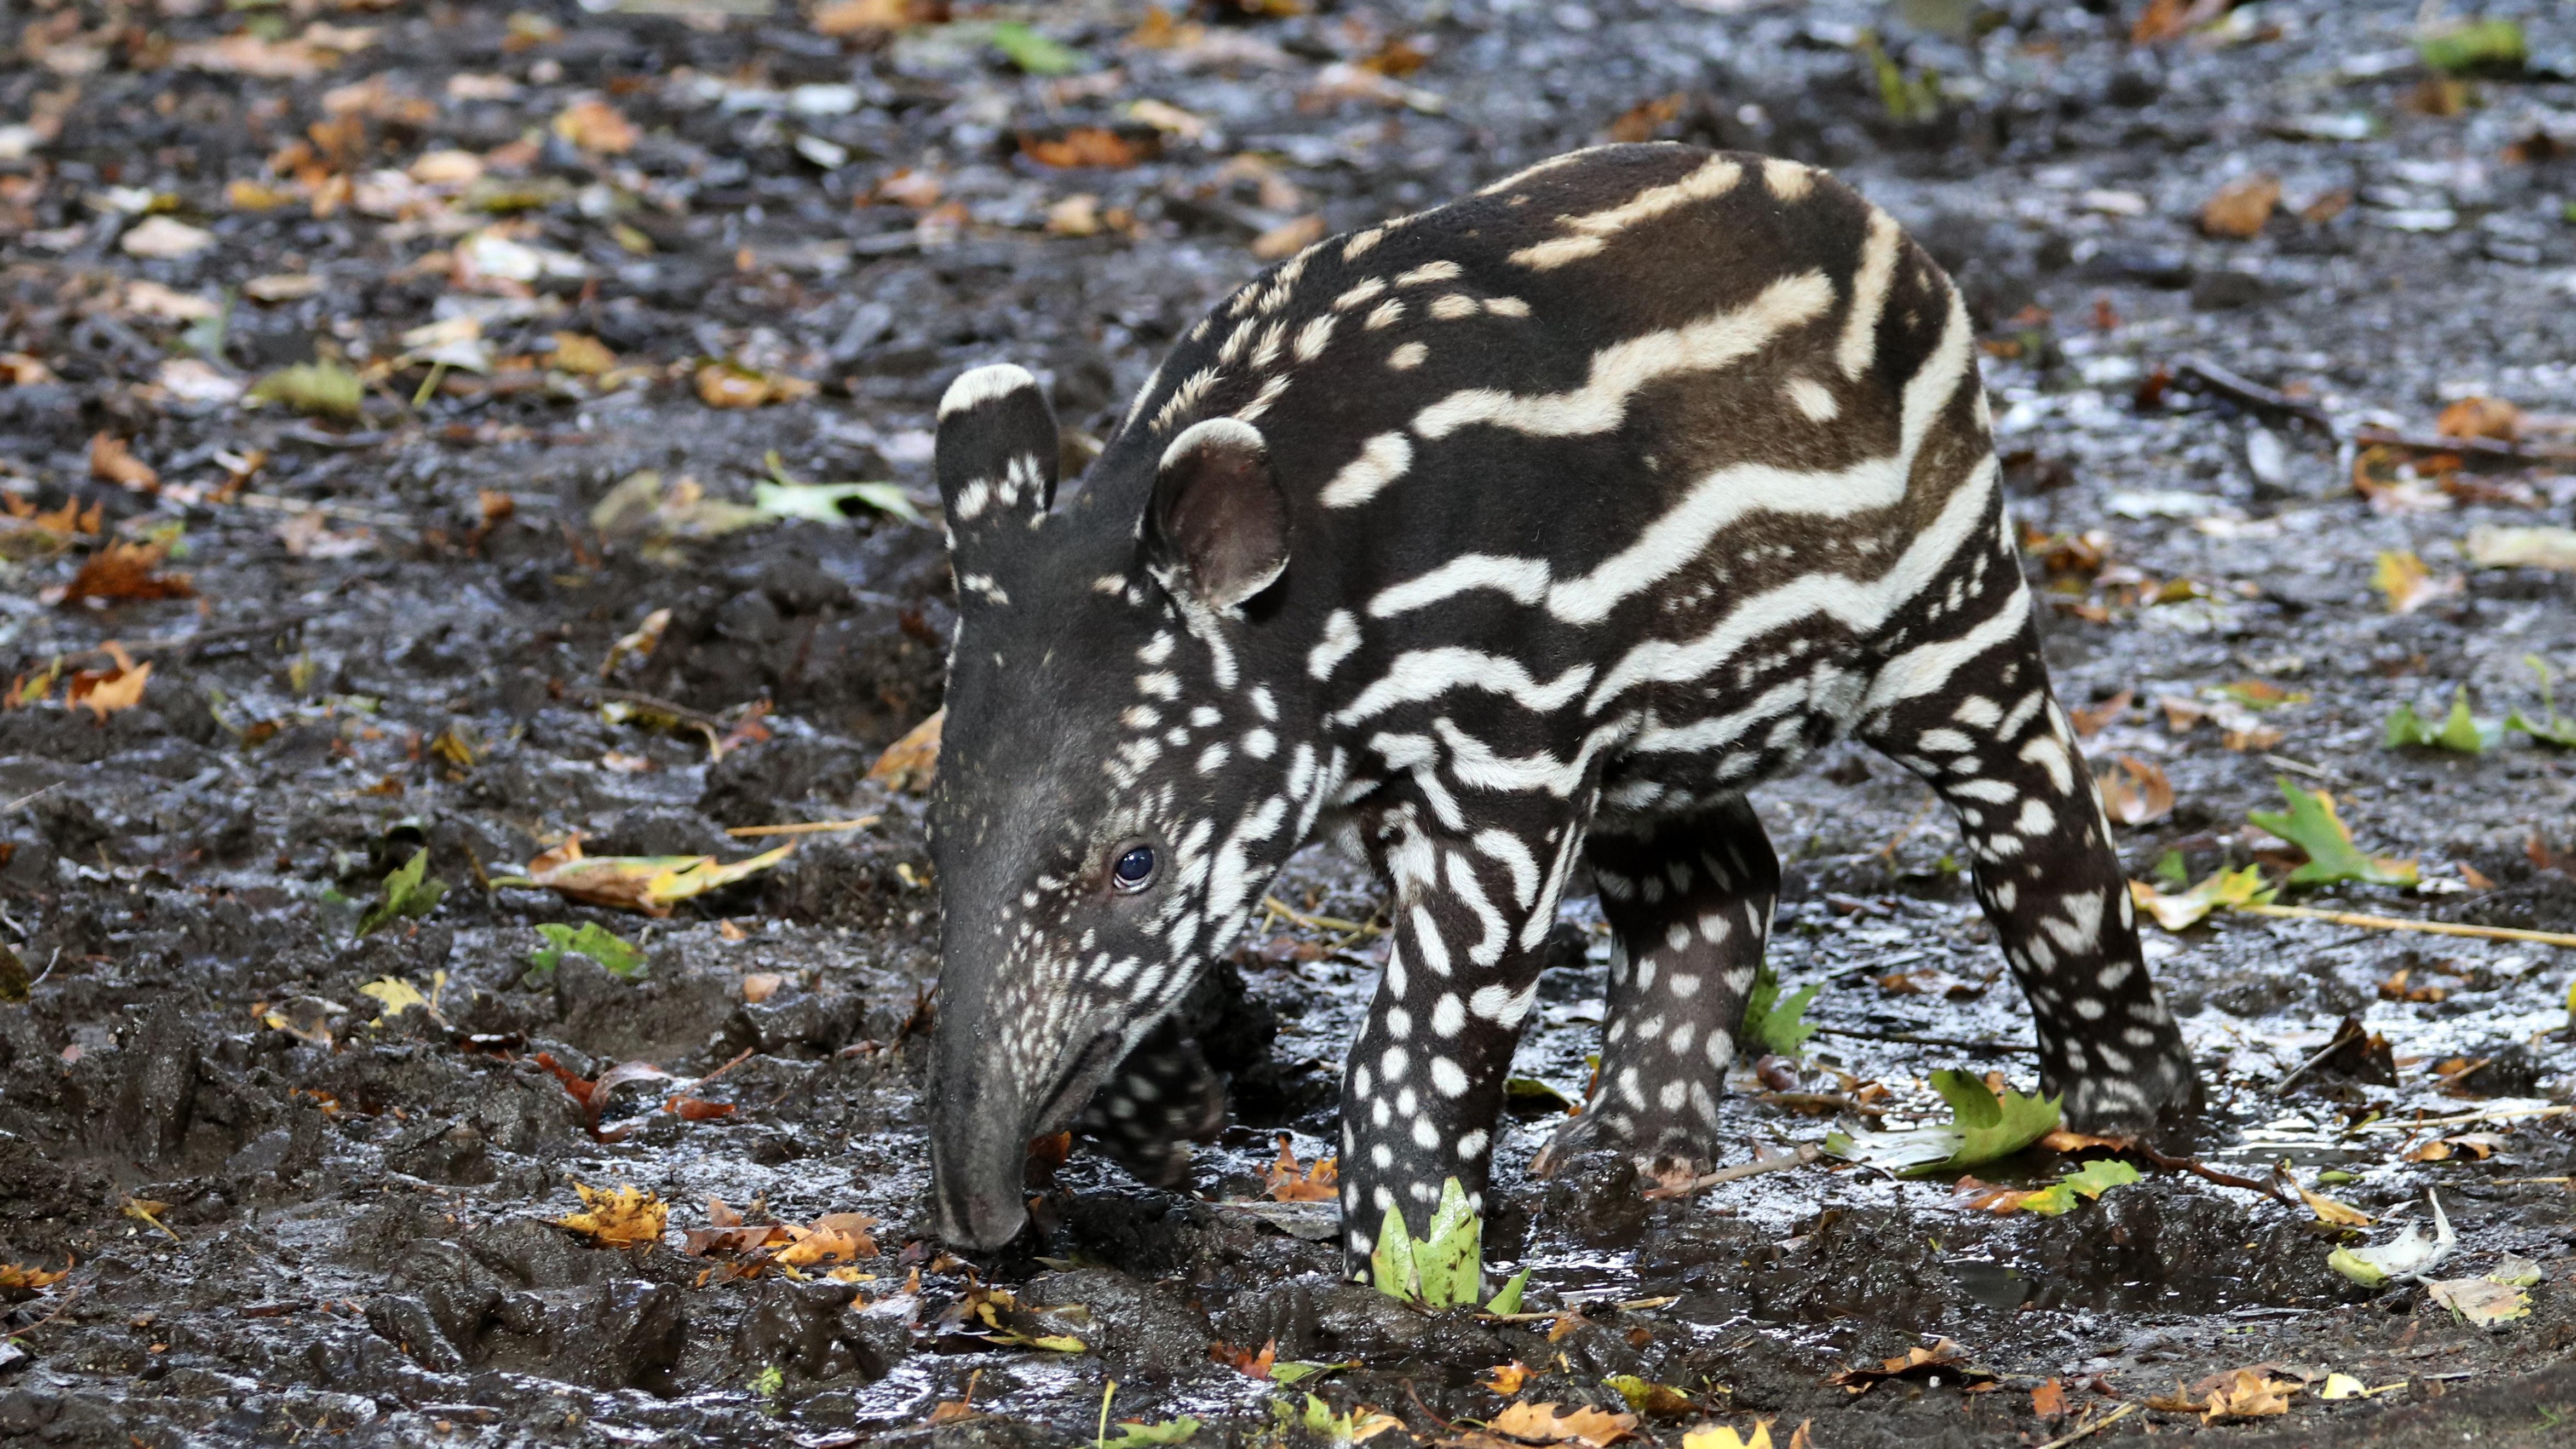 Say hello to Don – San Diego Zoo's adorable baby tapir has